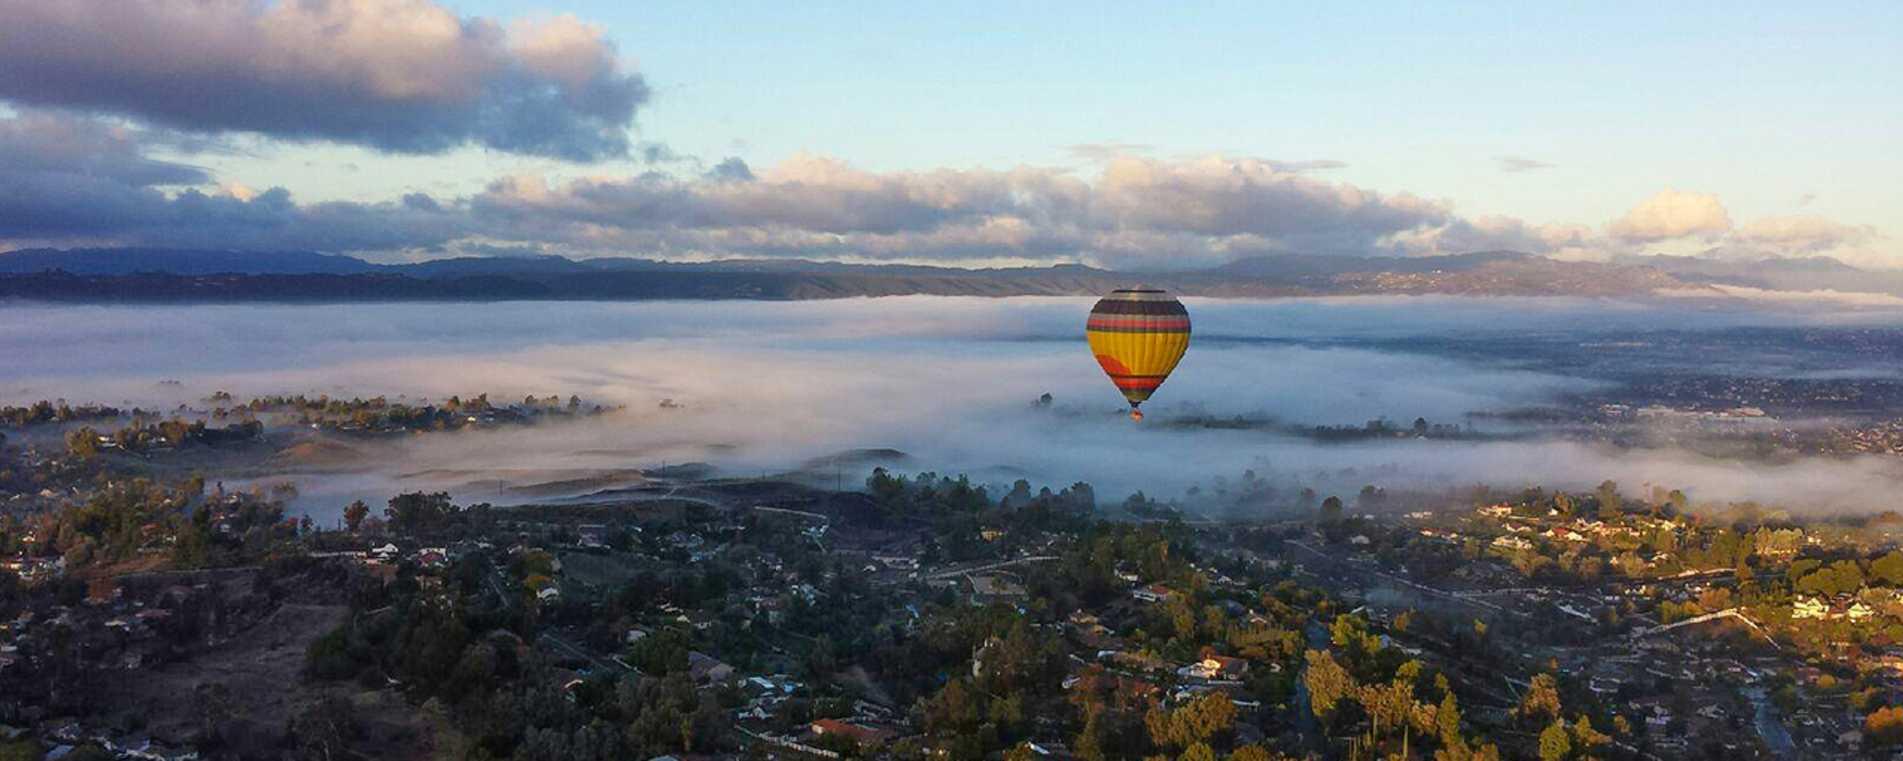 Panorama- A Balloon Adventure By California Dreamin